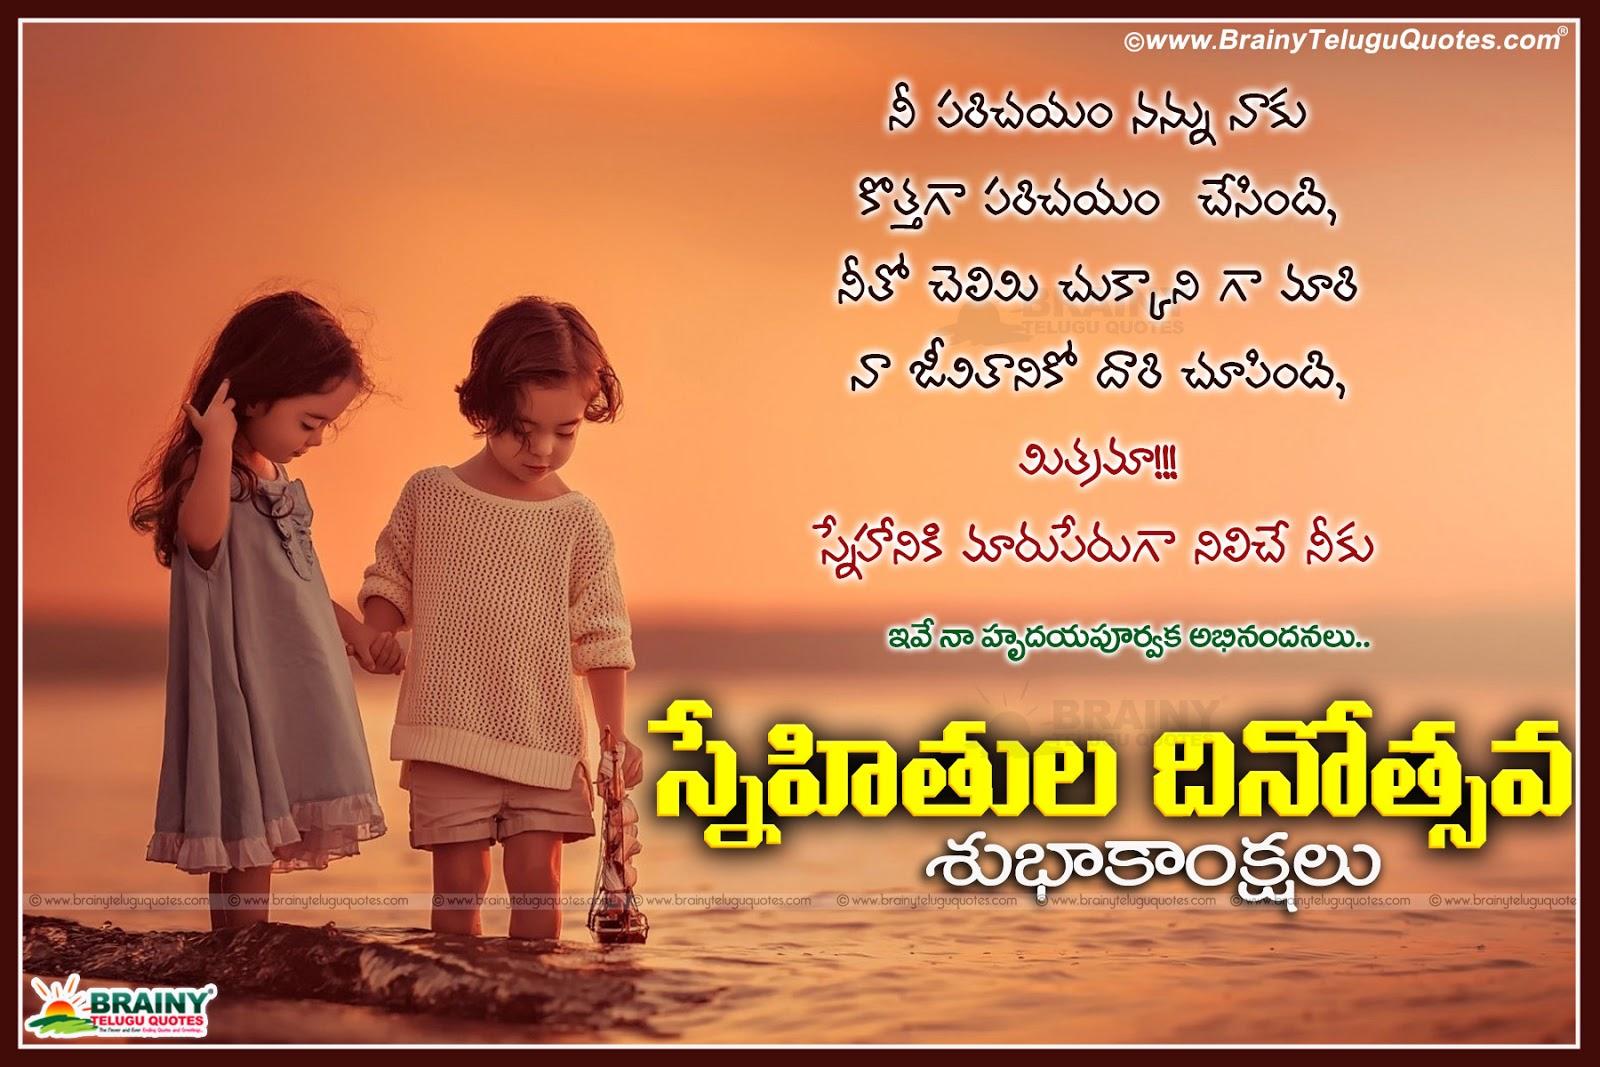 friendship day best quotations in telugu cute children hd